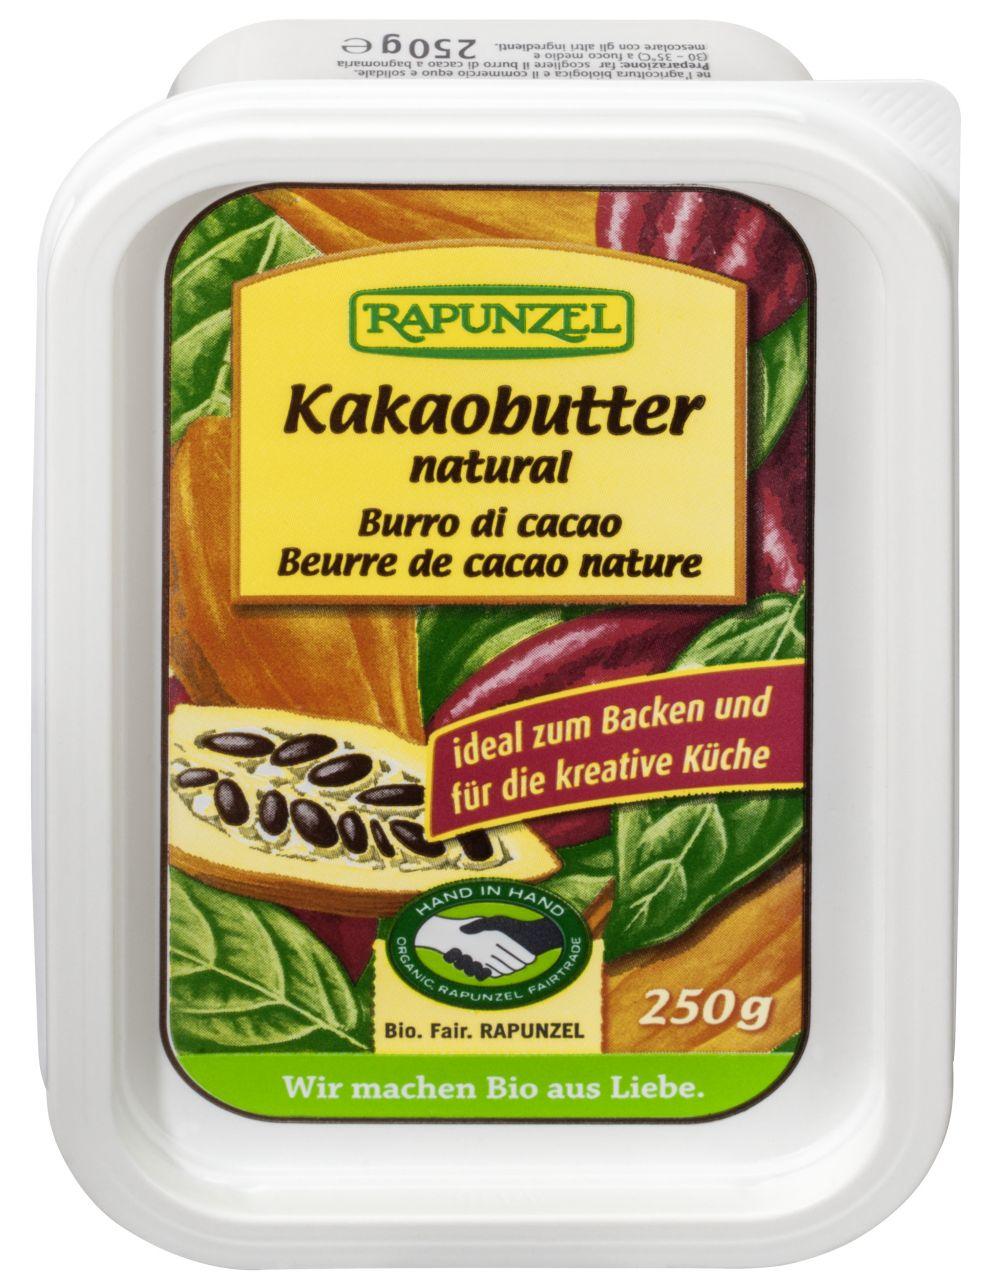 Kakaobutter natural HIH